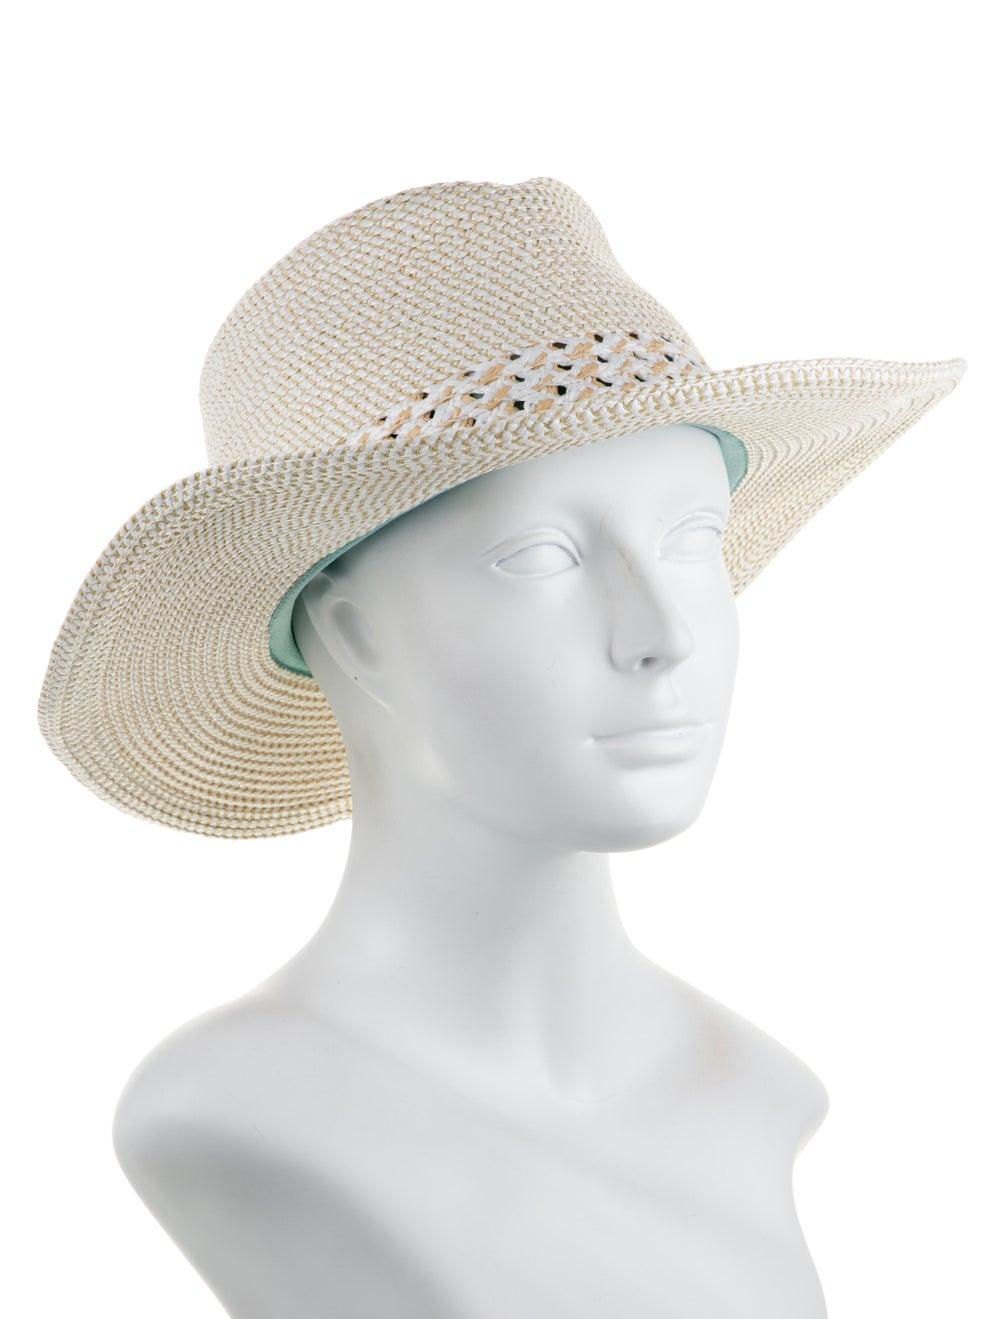 Eric Javits Woven Straw Hat white - image 3